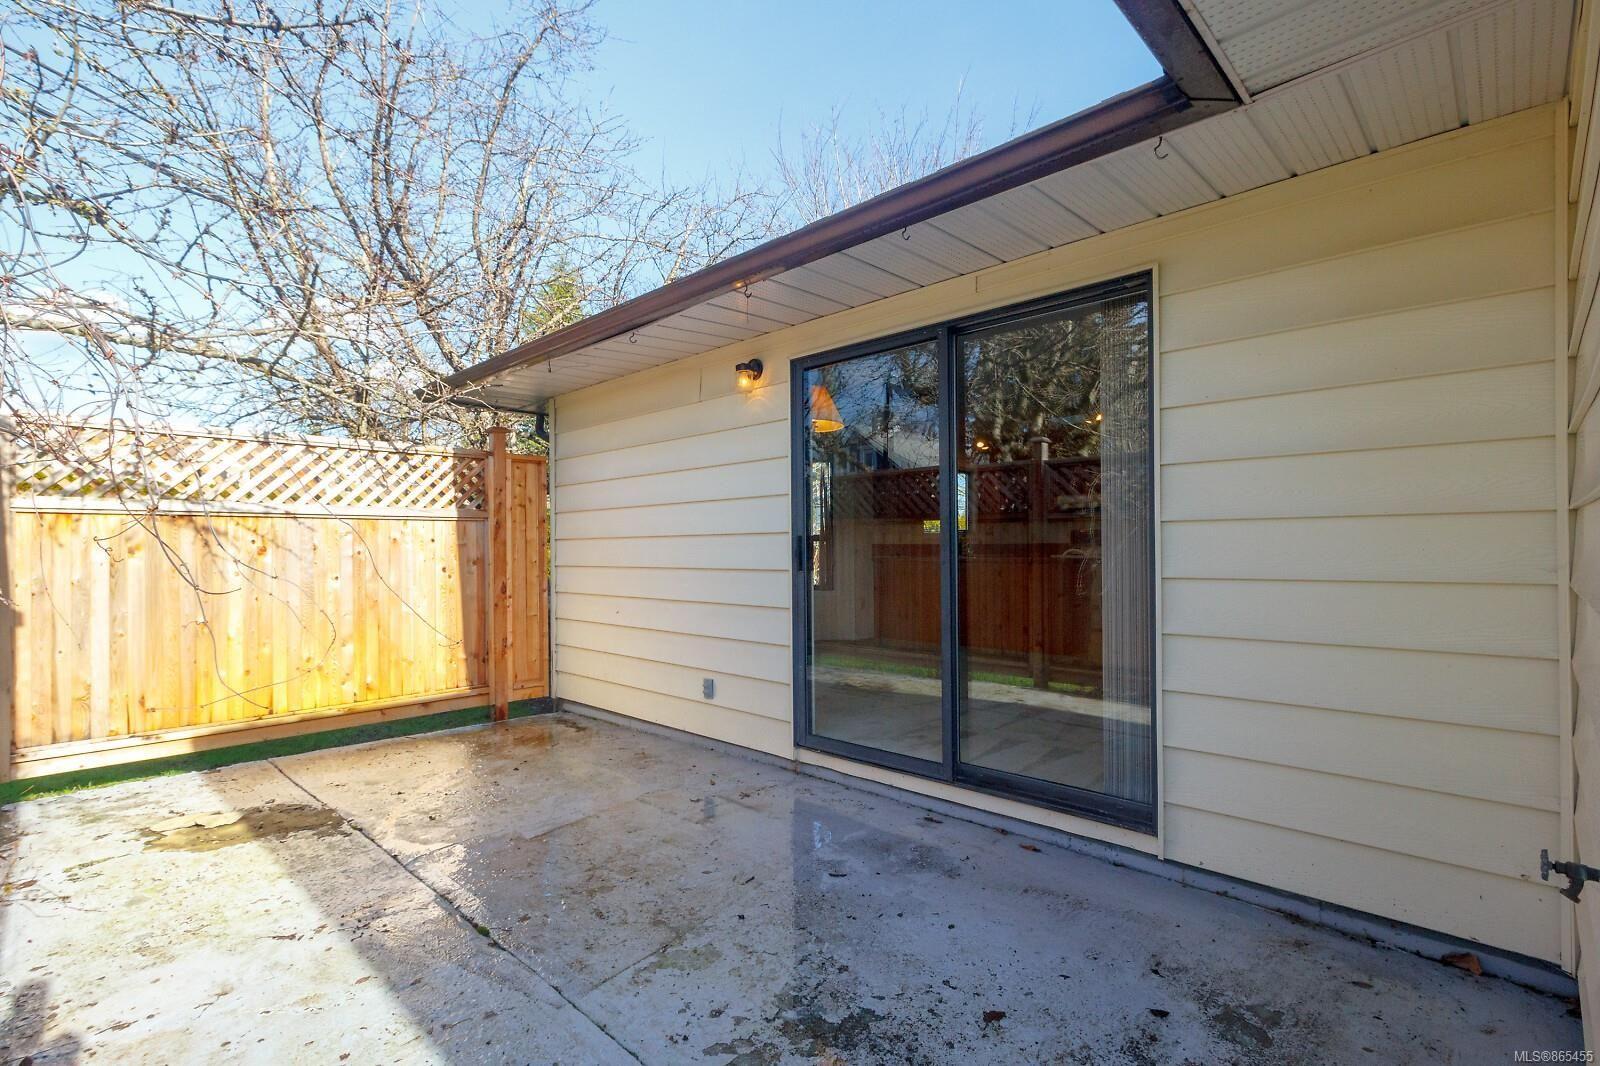 Photo 24: Photos: 399 Beech Ave in : Du East Duncan House for sale (Duncan)  : MLS®# 865455